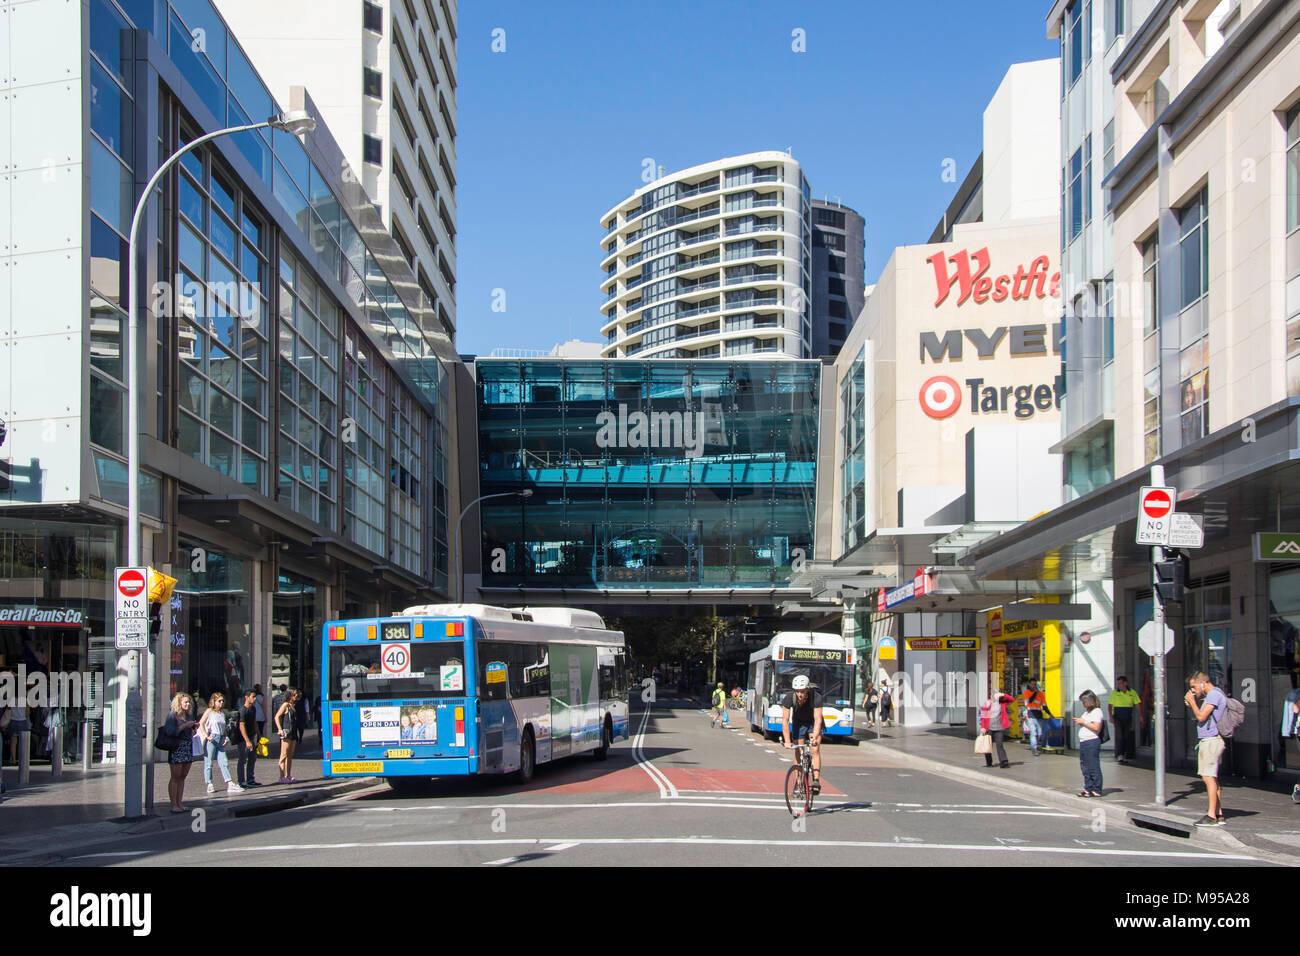 Westfield shopping centre, Oxford Street, Bondi Junction, Sydney, New South Wales, Australia - Stock Image